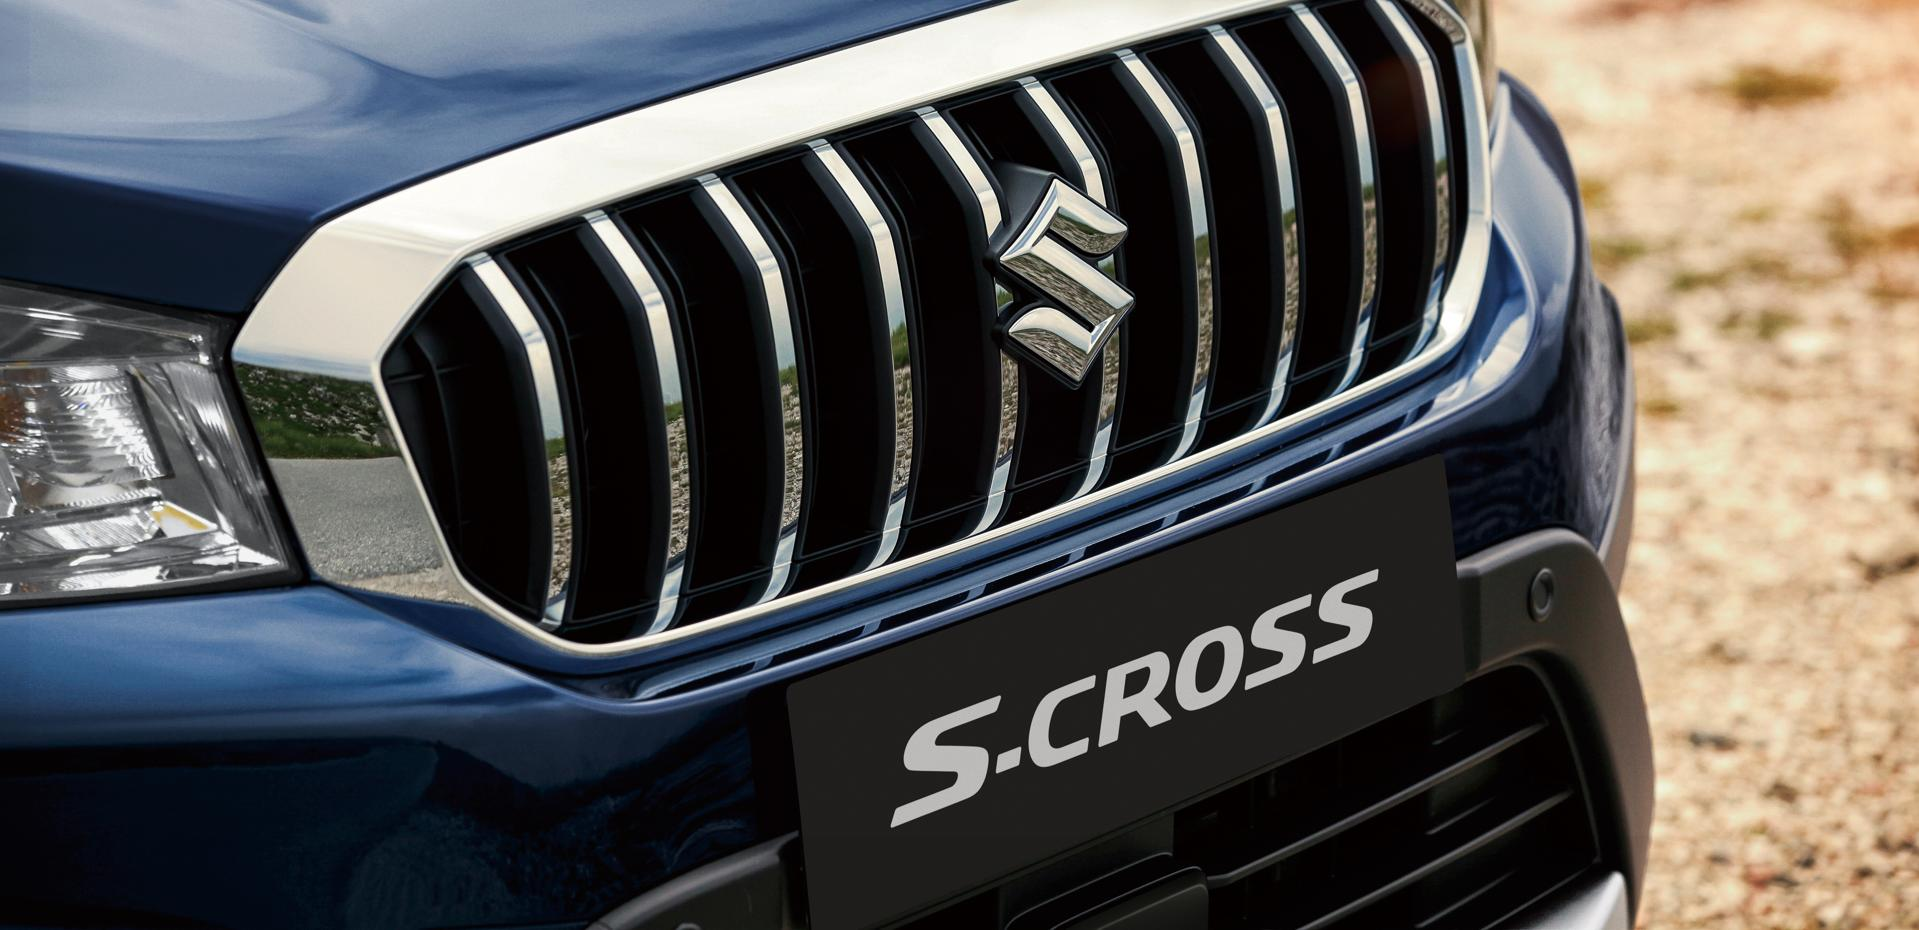 S-Cross